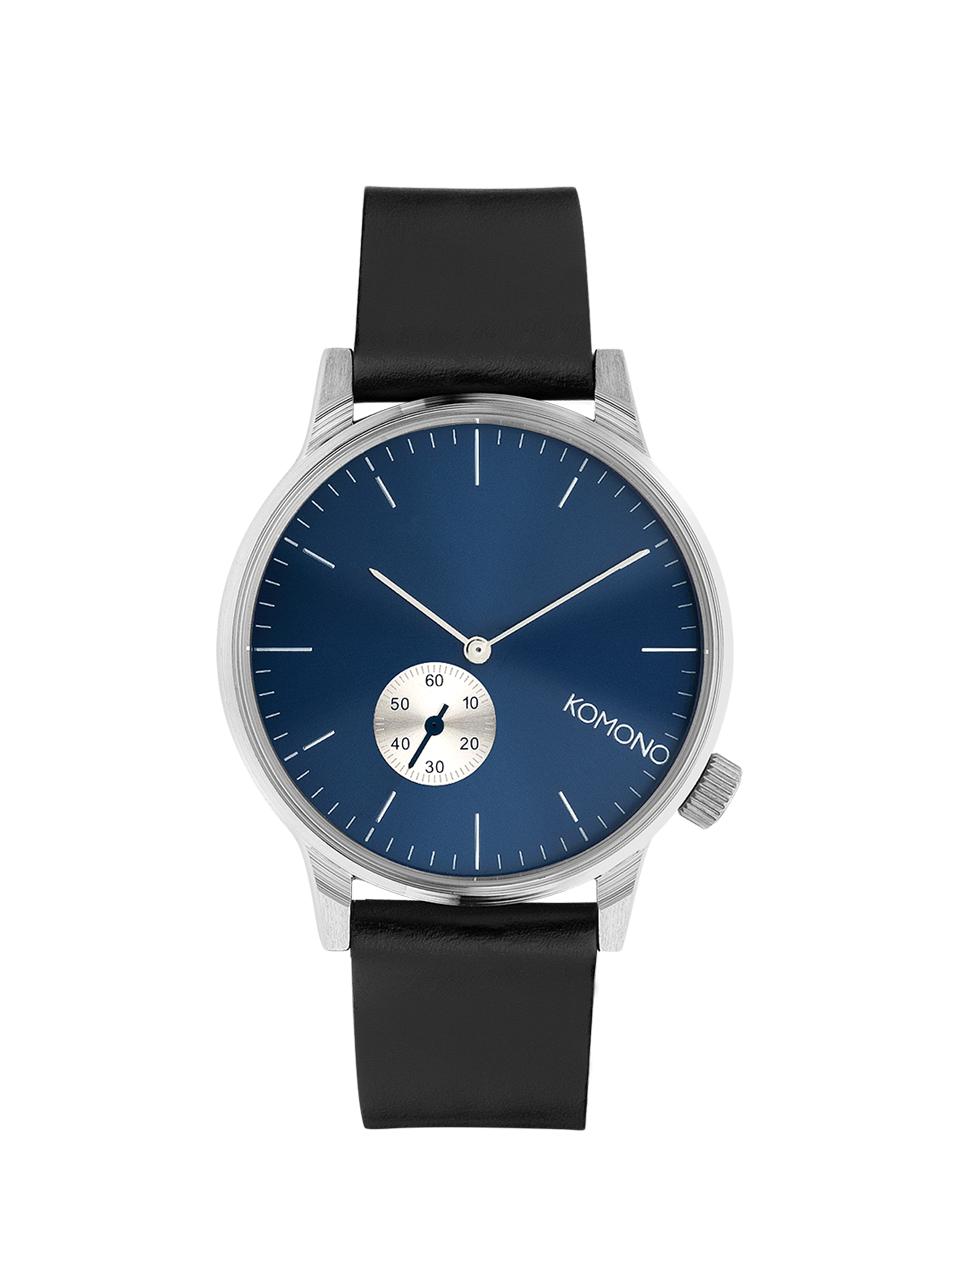 Černé unisex hodinky s modrým ciferníkem Komono Winston Subs